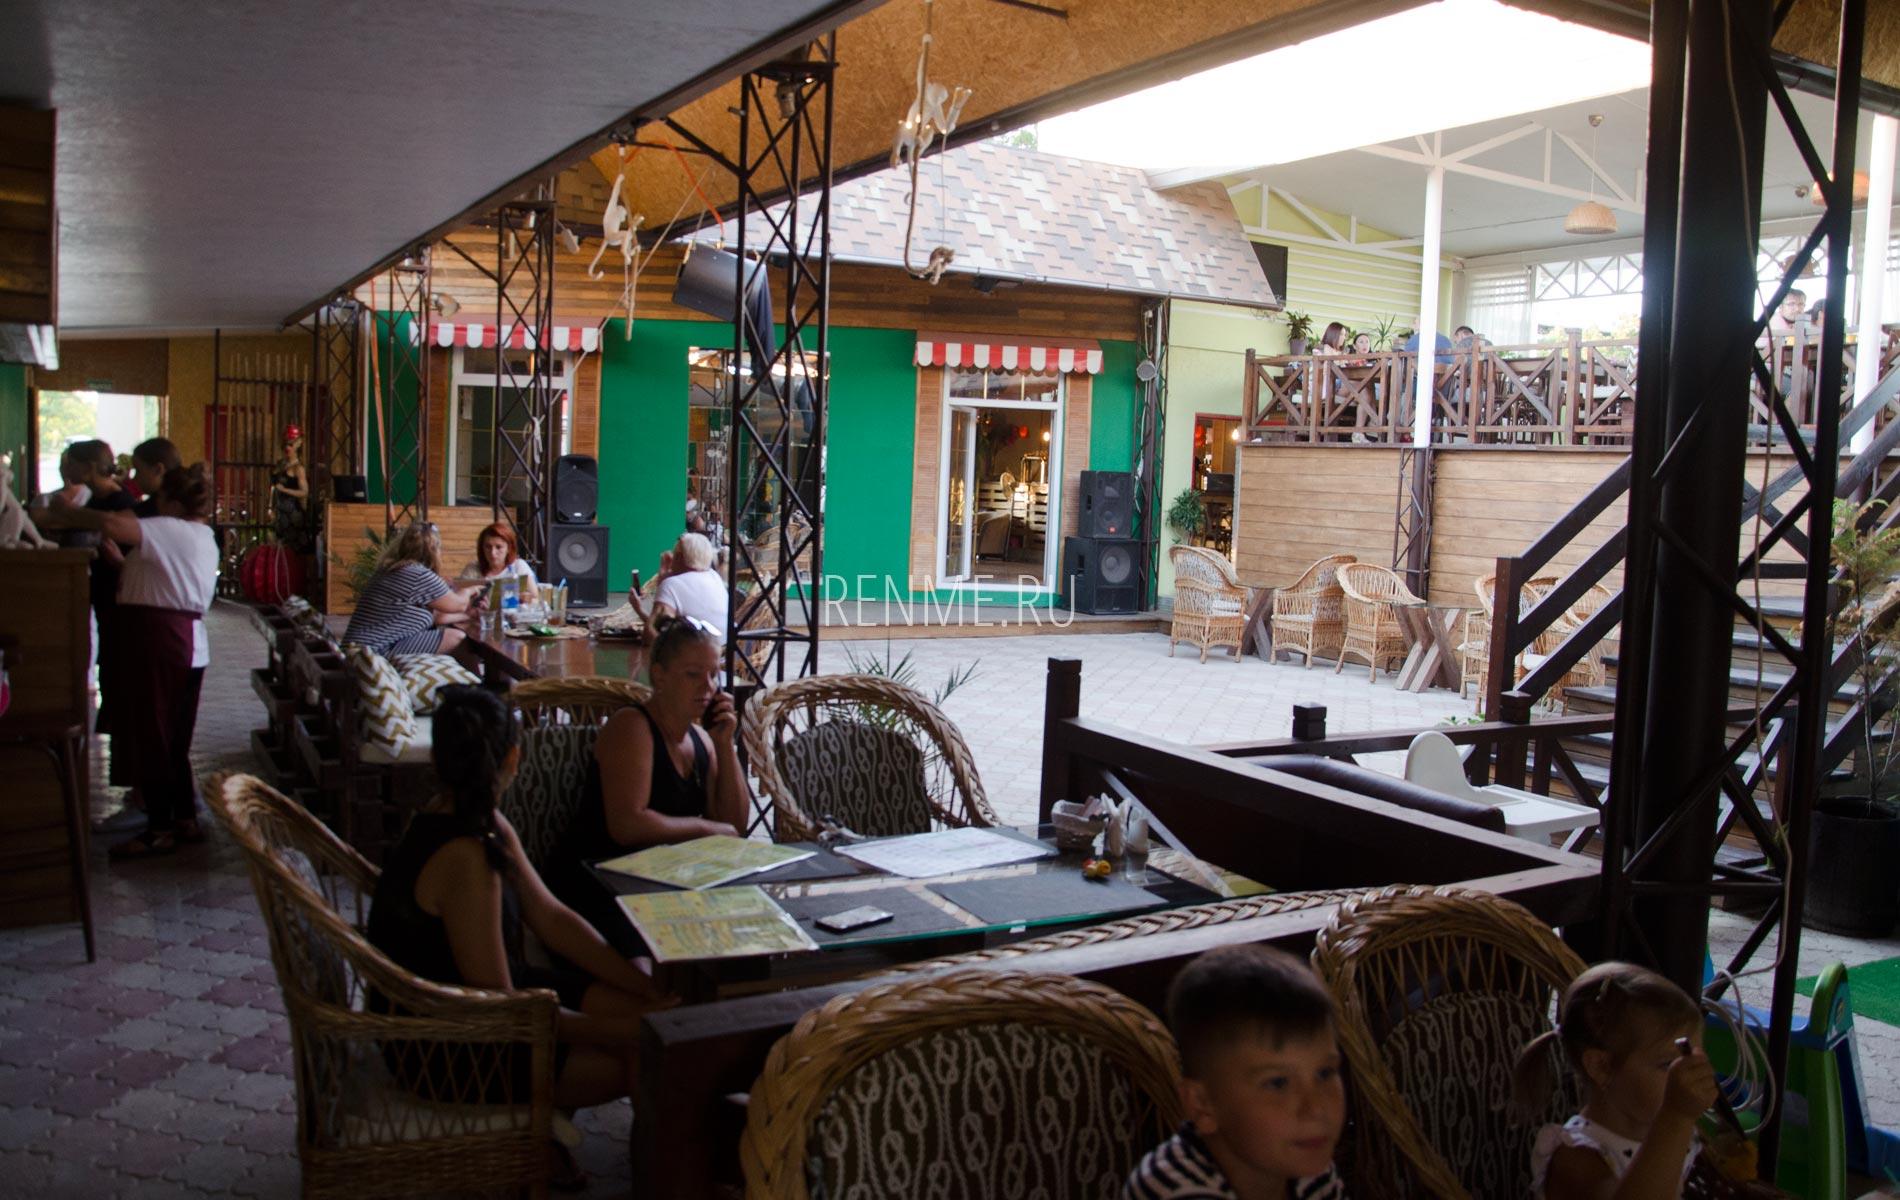 Кафе Аркадия в августе 2020. Фото Заозёрного